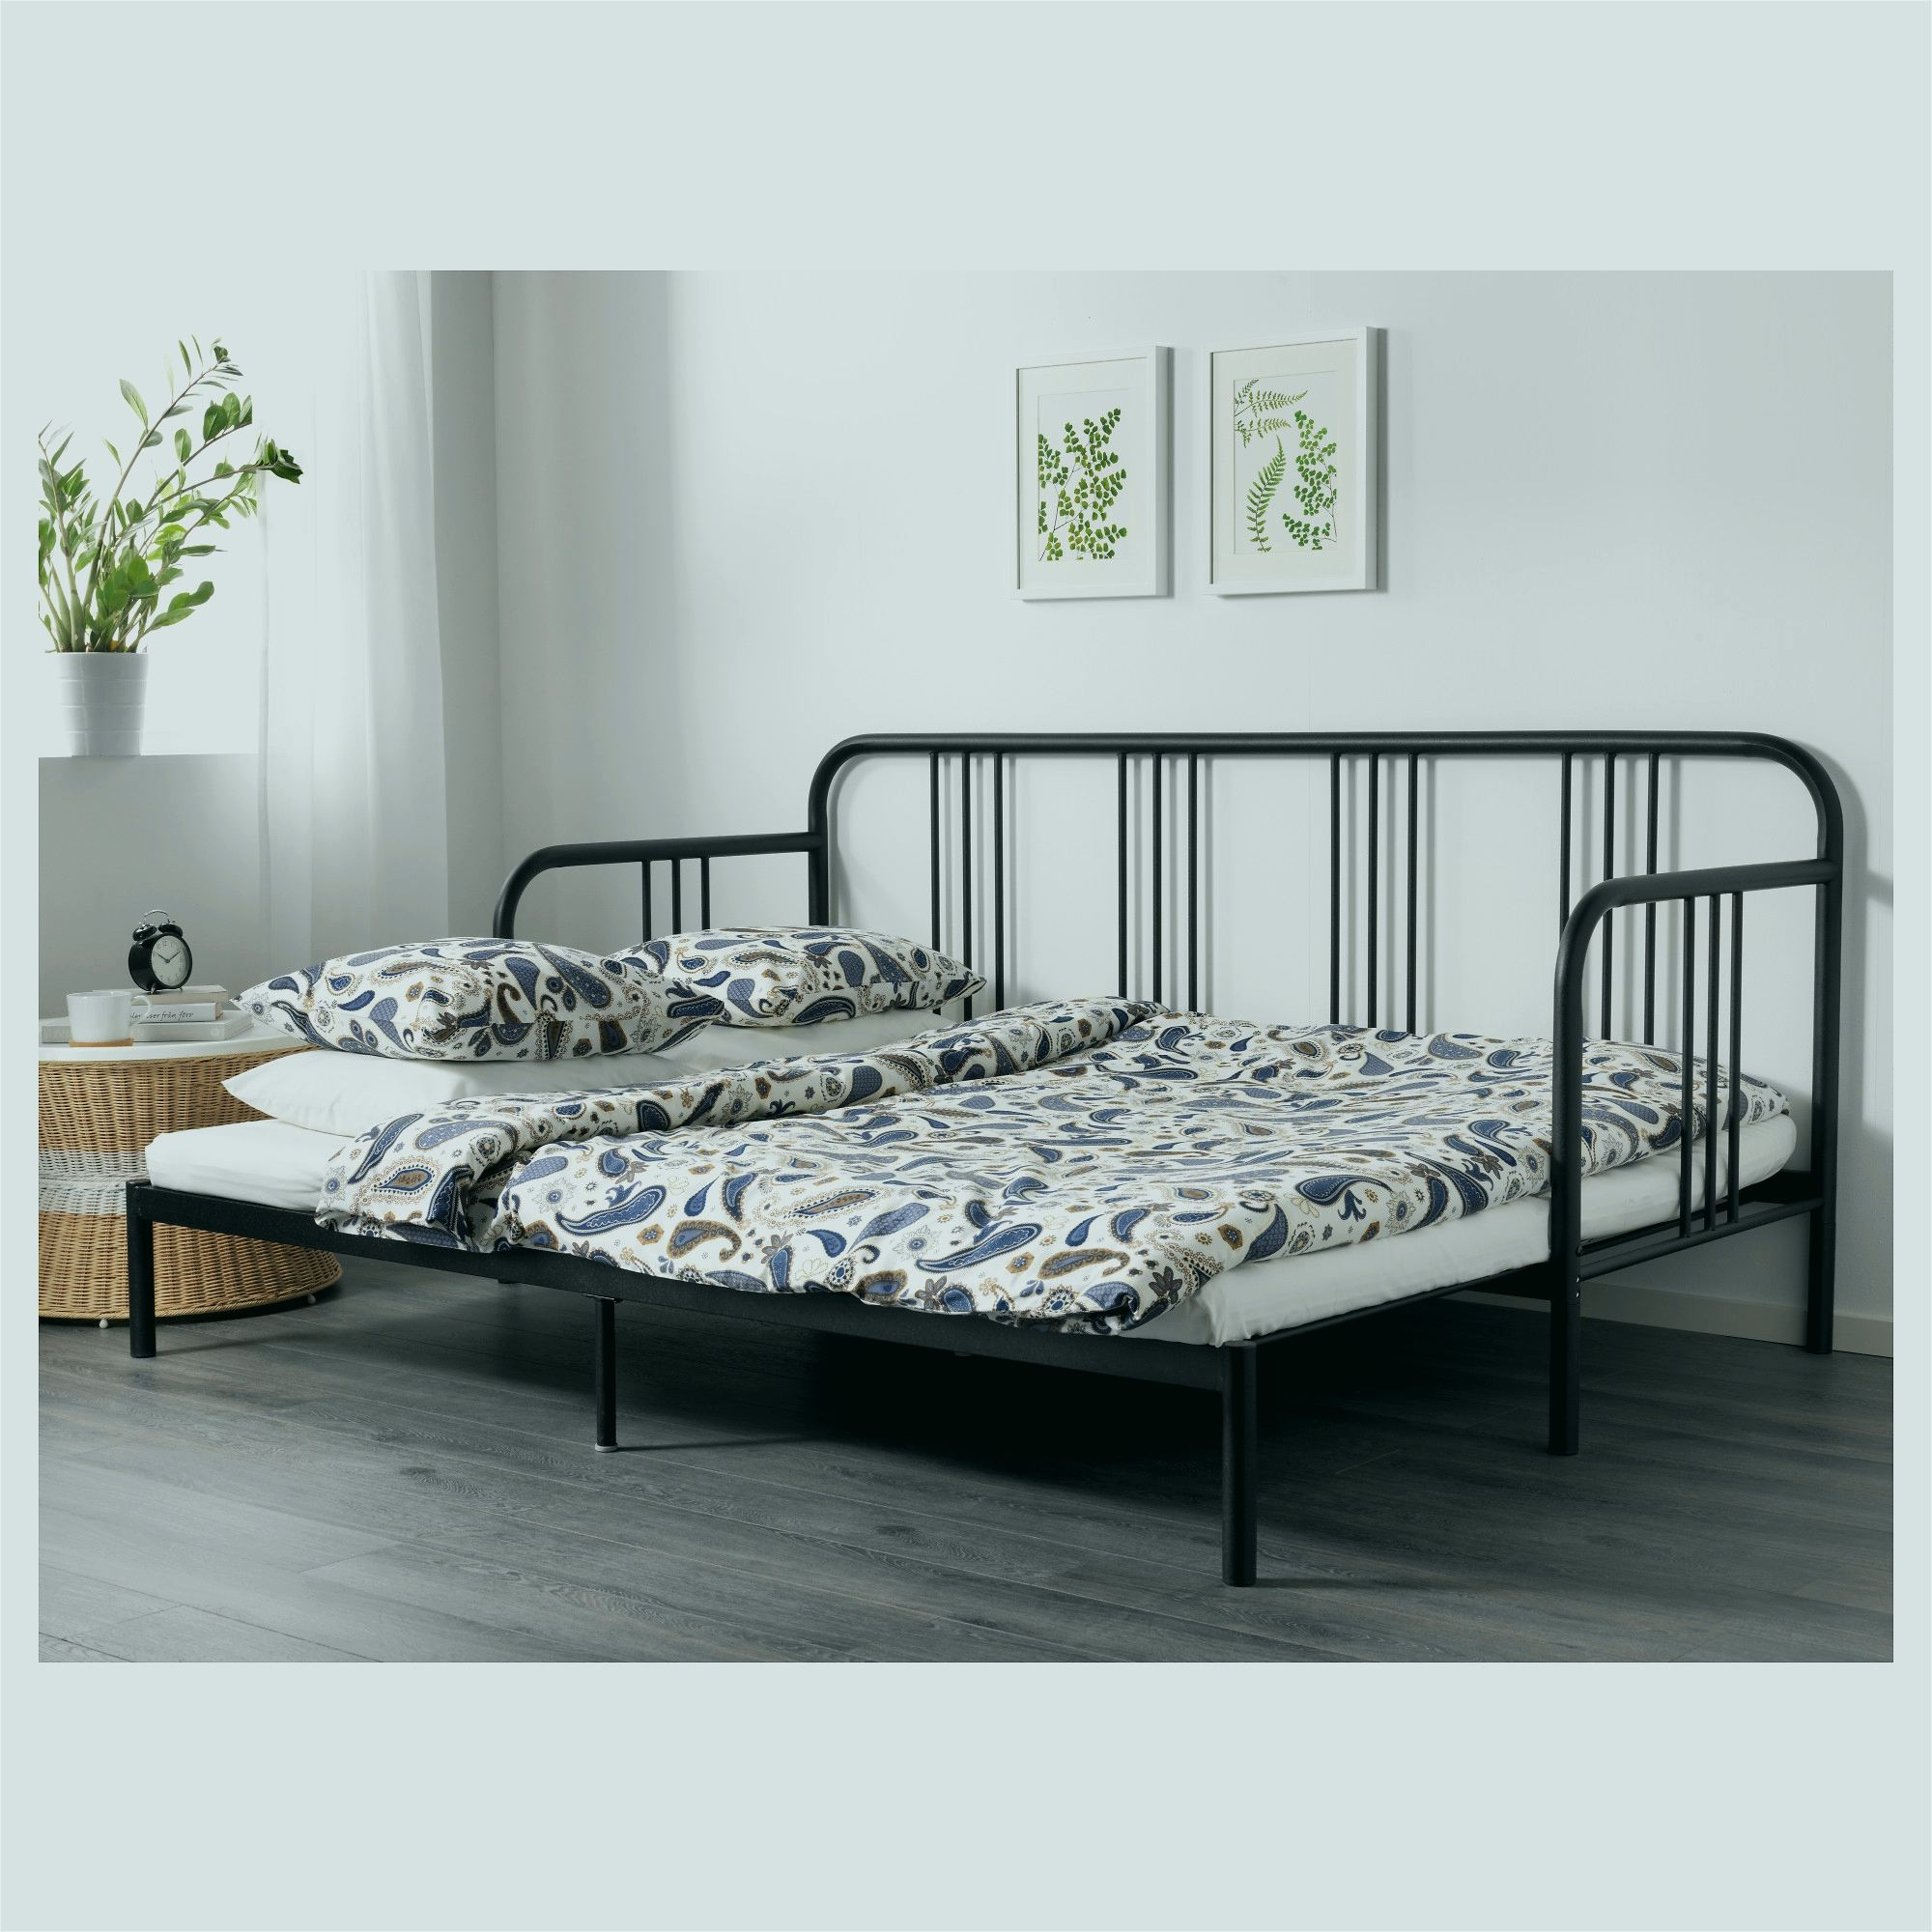 lit superpos ikea 3 places impressionnant photos admir. Black Bedroom Furniture Sets. Home Design Ideas